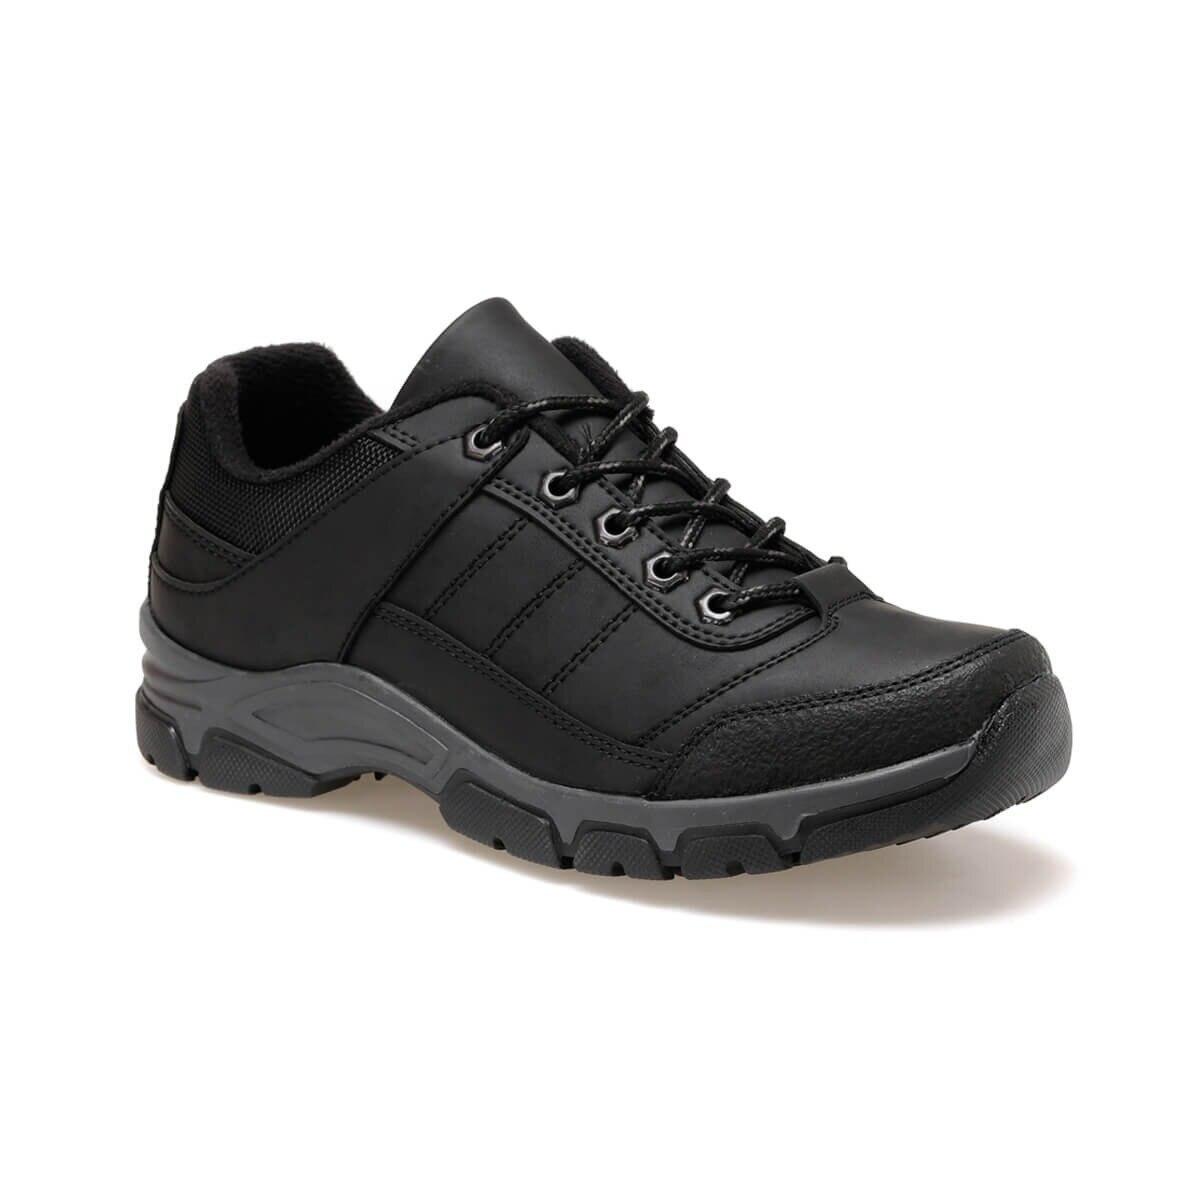 FLO ASDEL Black Male Shoes Torex